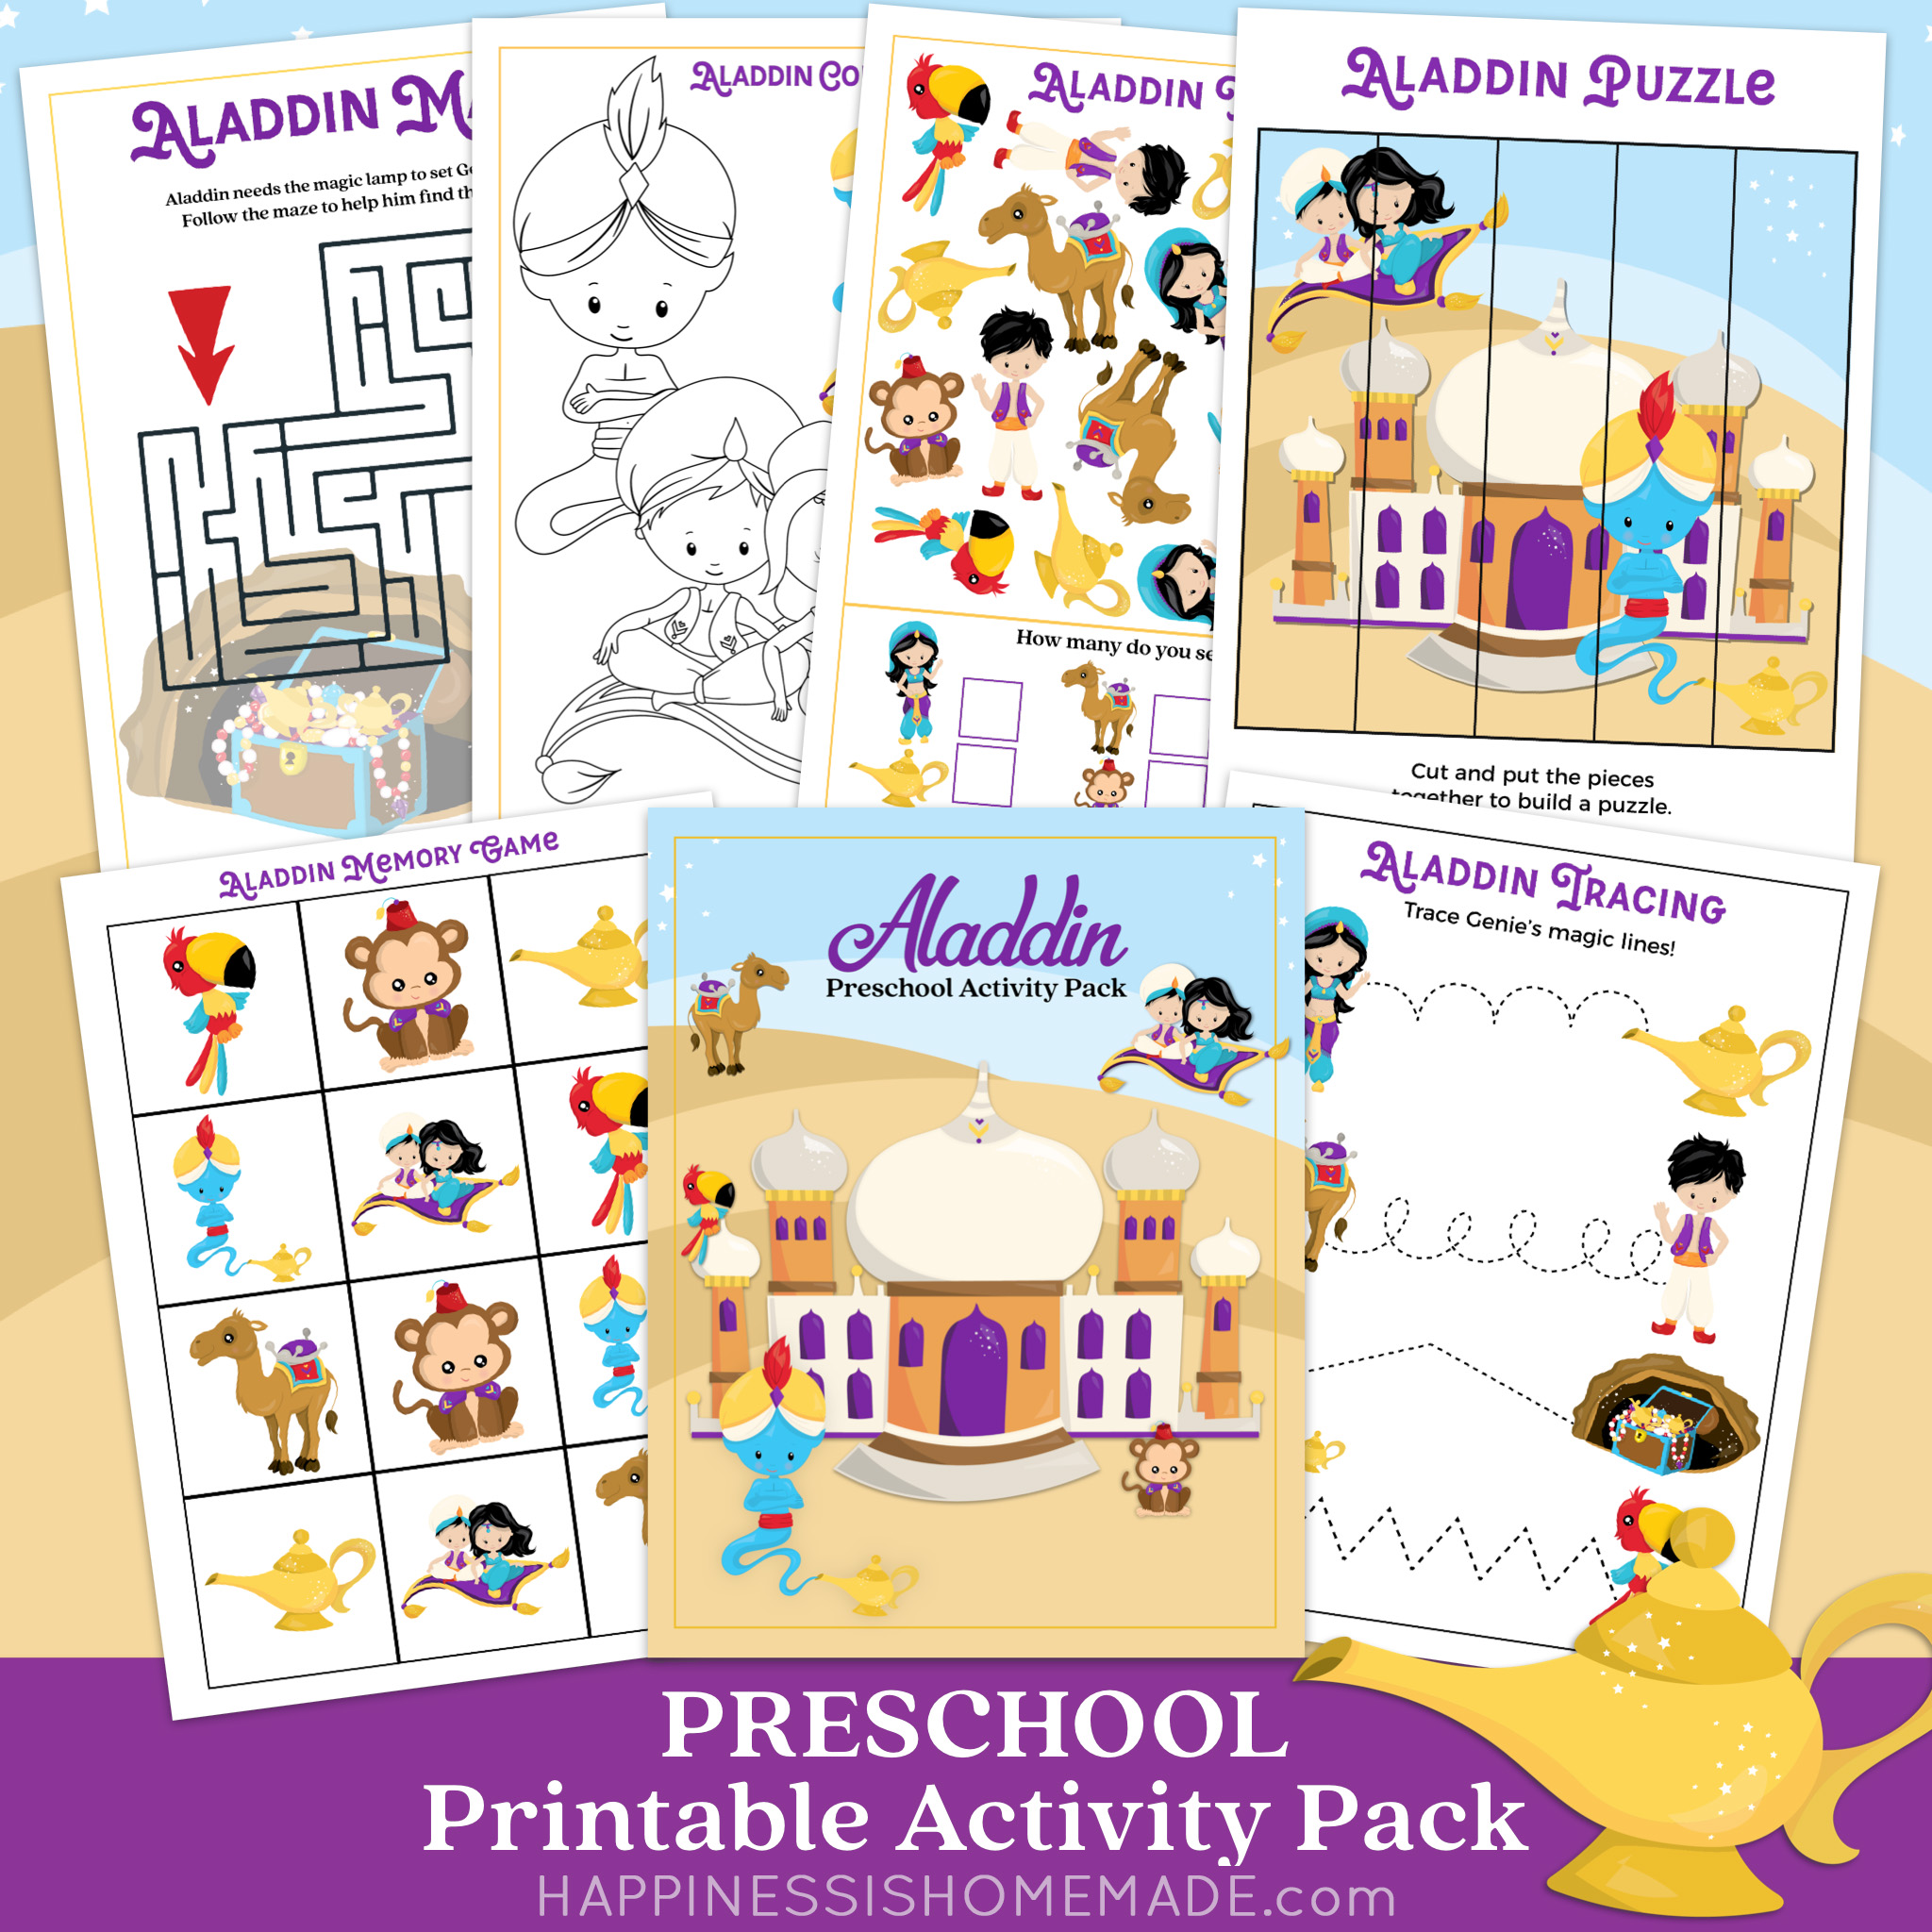 photo about Preschool Memory Book Printable called Aladdin Preschool Printables - Joy is Home made